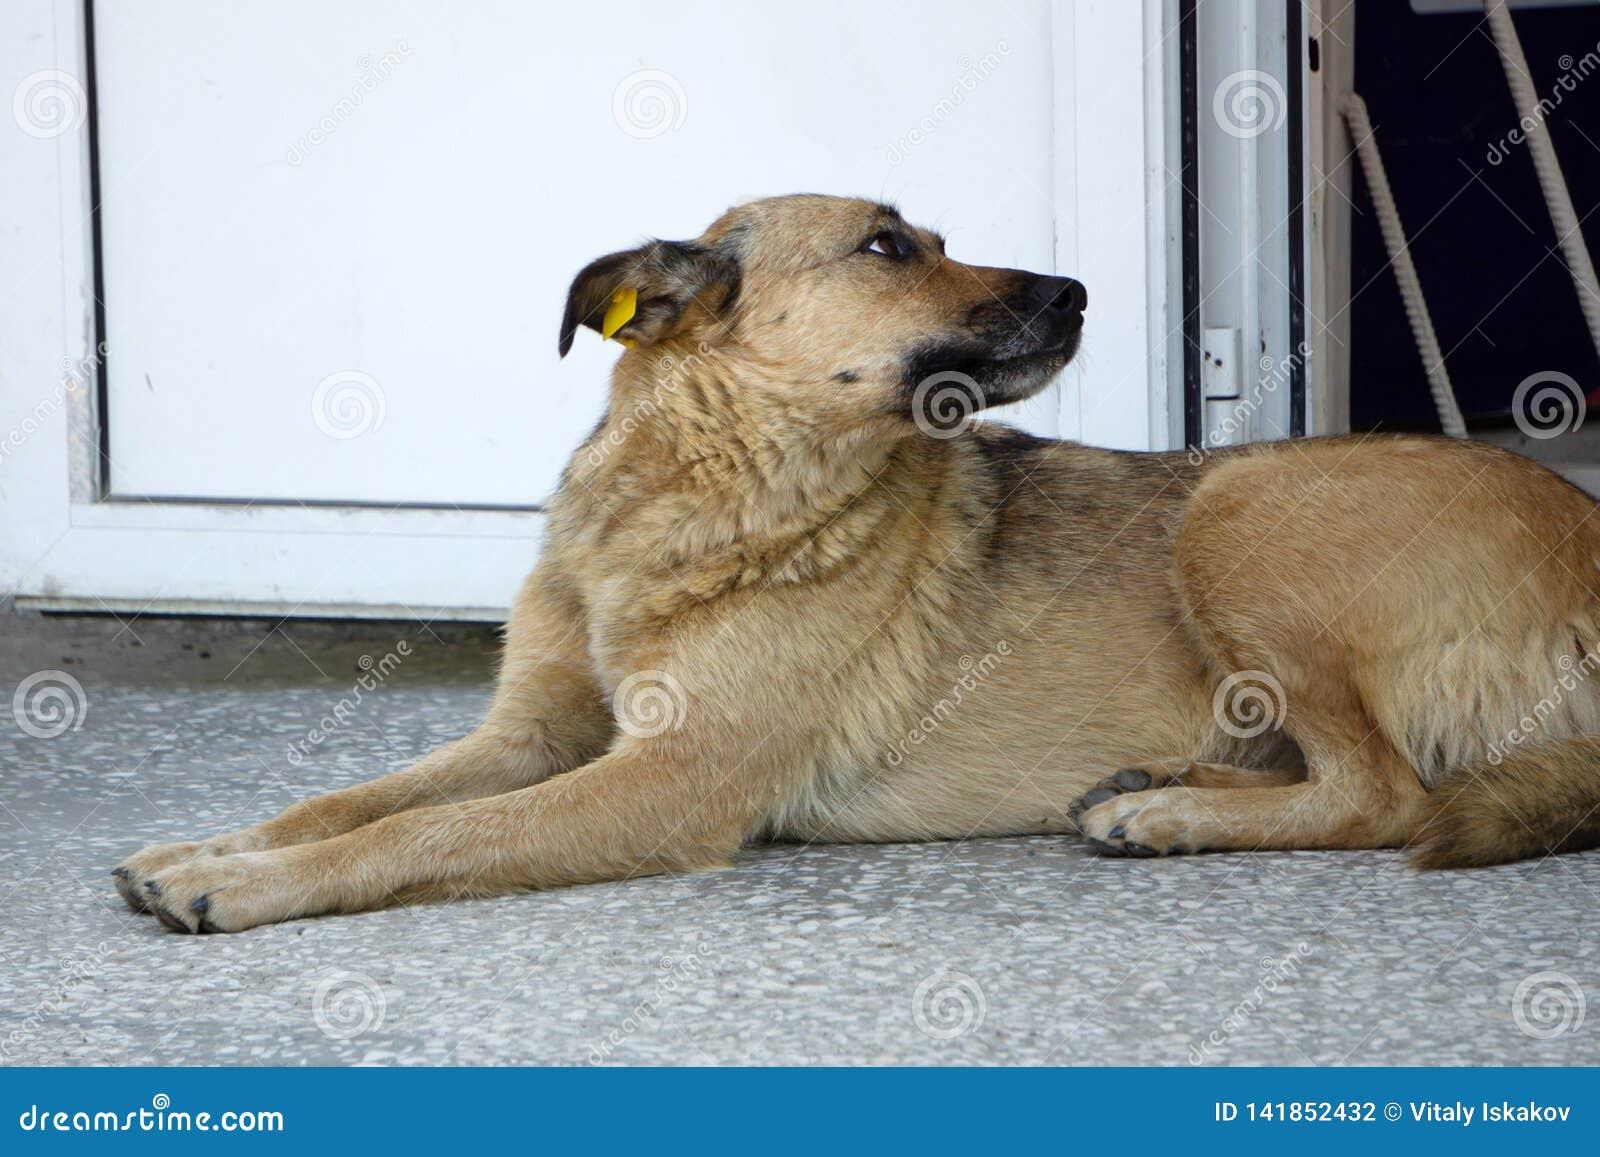 Hond welkom huis op bruin mat grappig huis